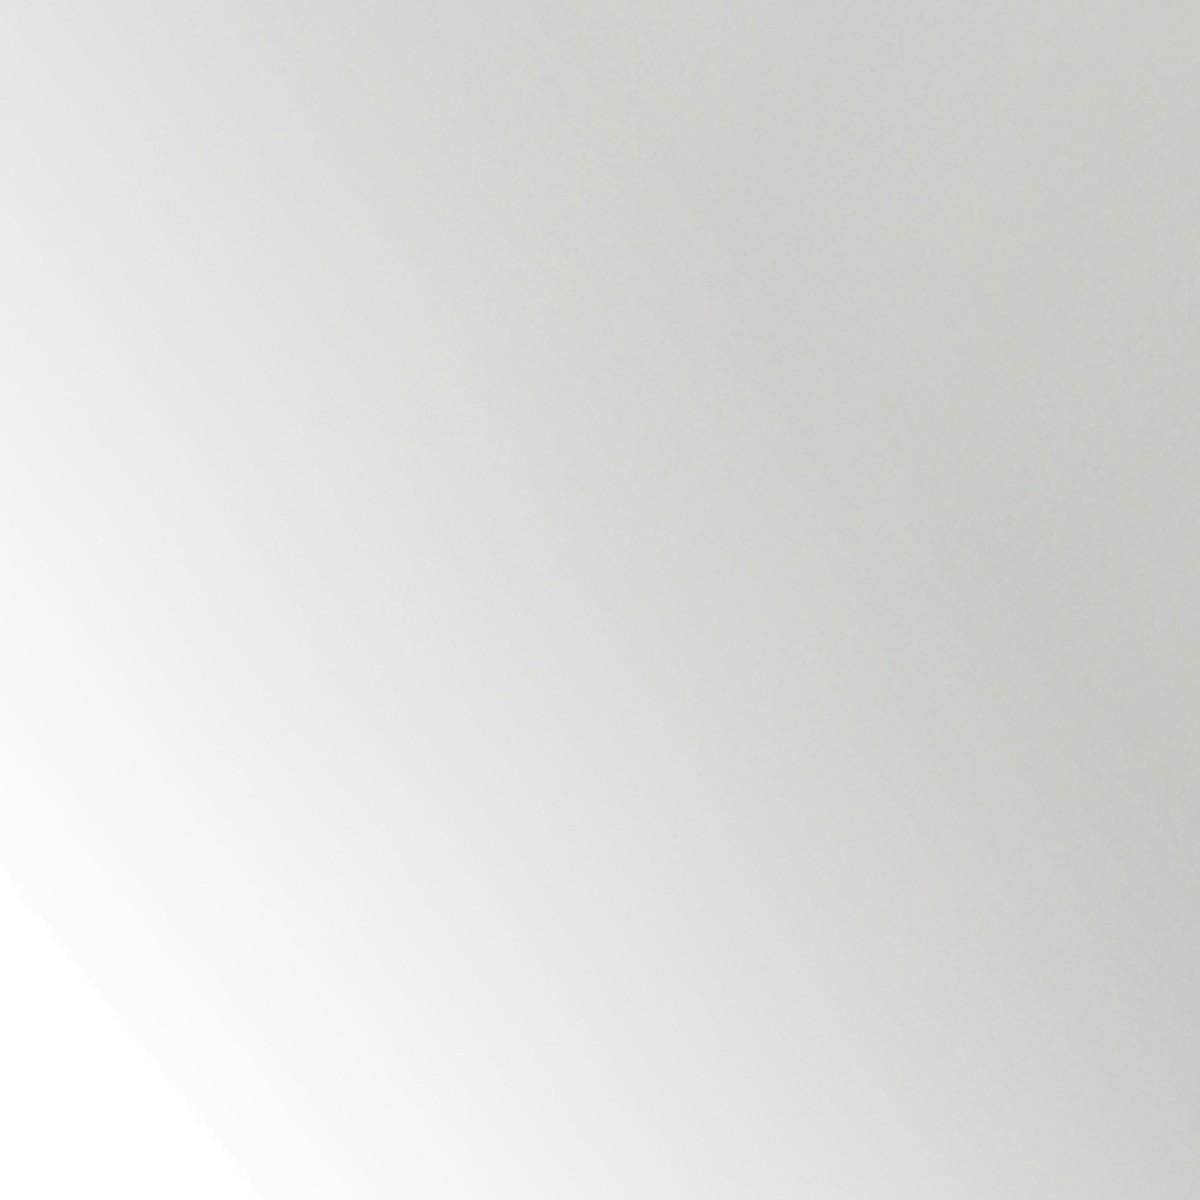 Catellani & Smith Luna LED 17 / 30 Wandleuchte, Ø: 17 cm, weiß